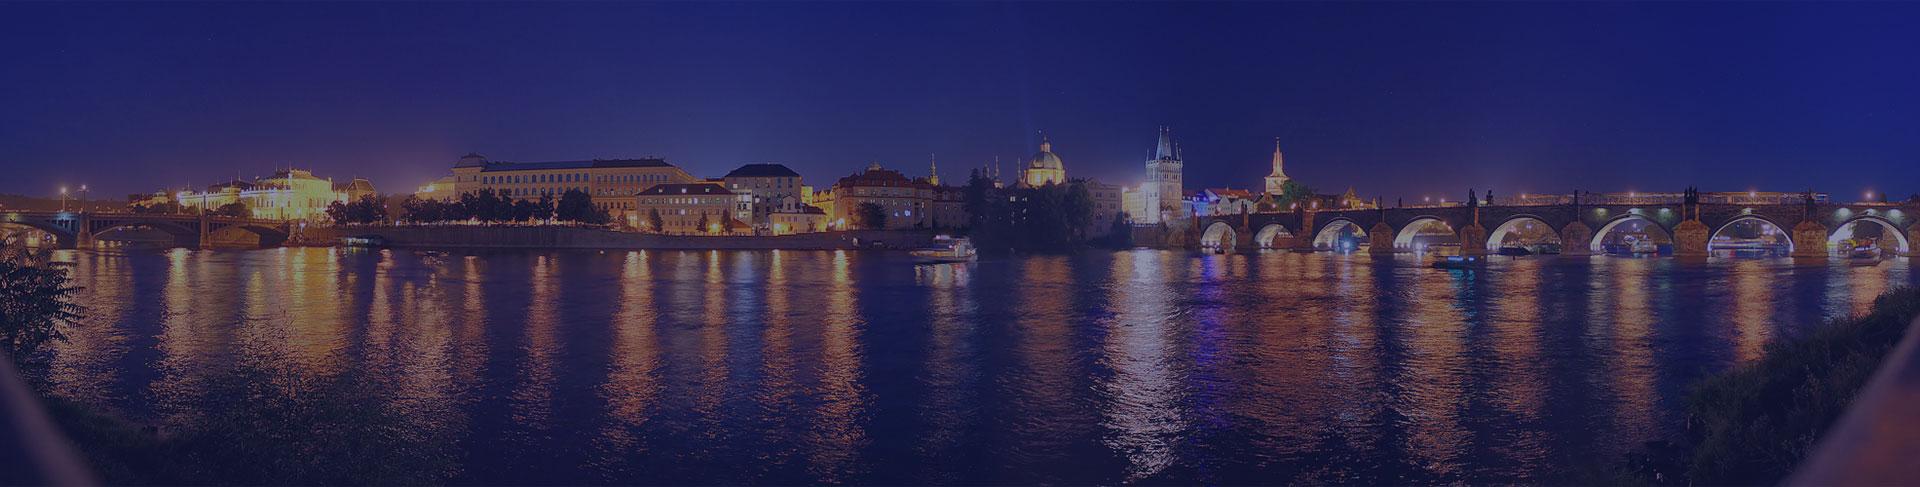 Prag - Češka Republika